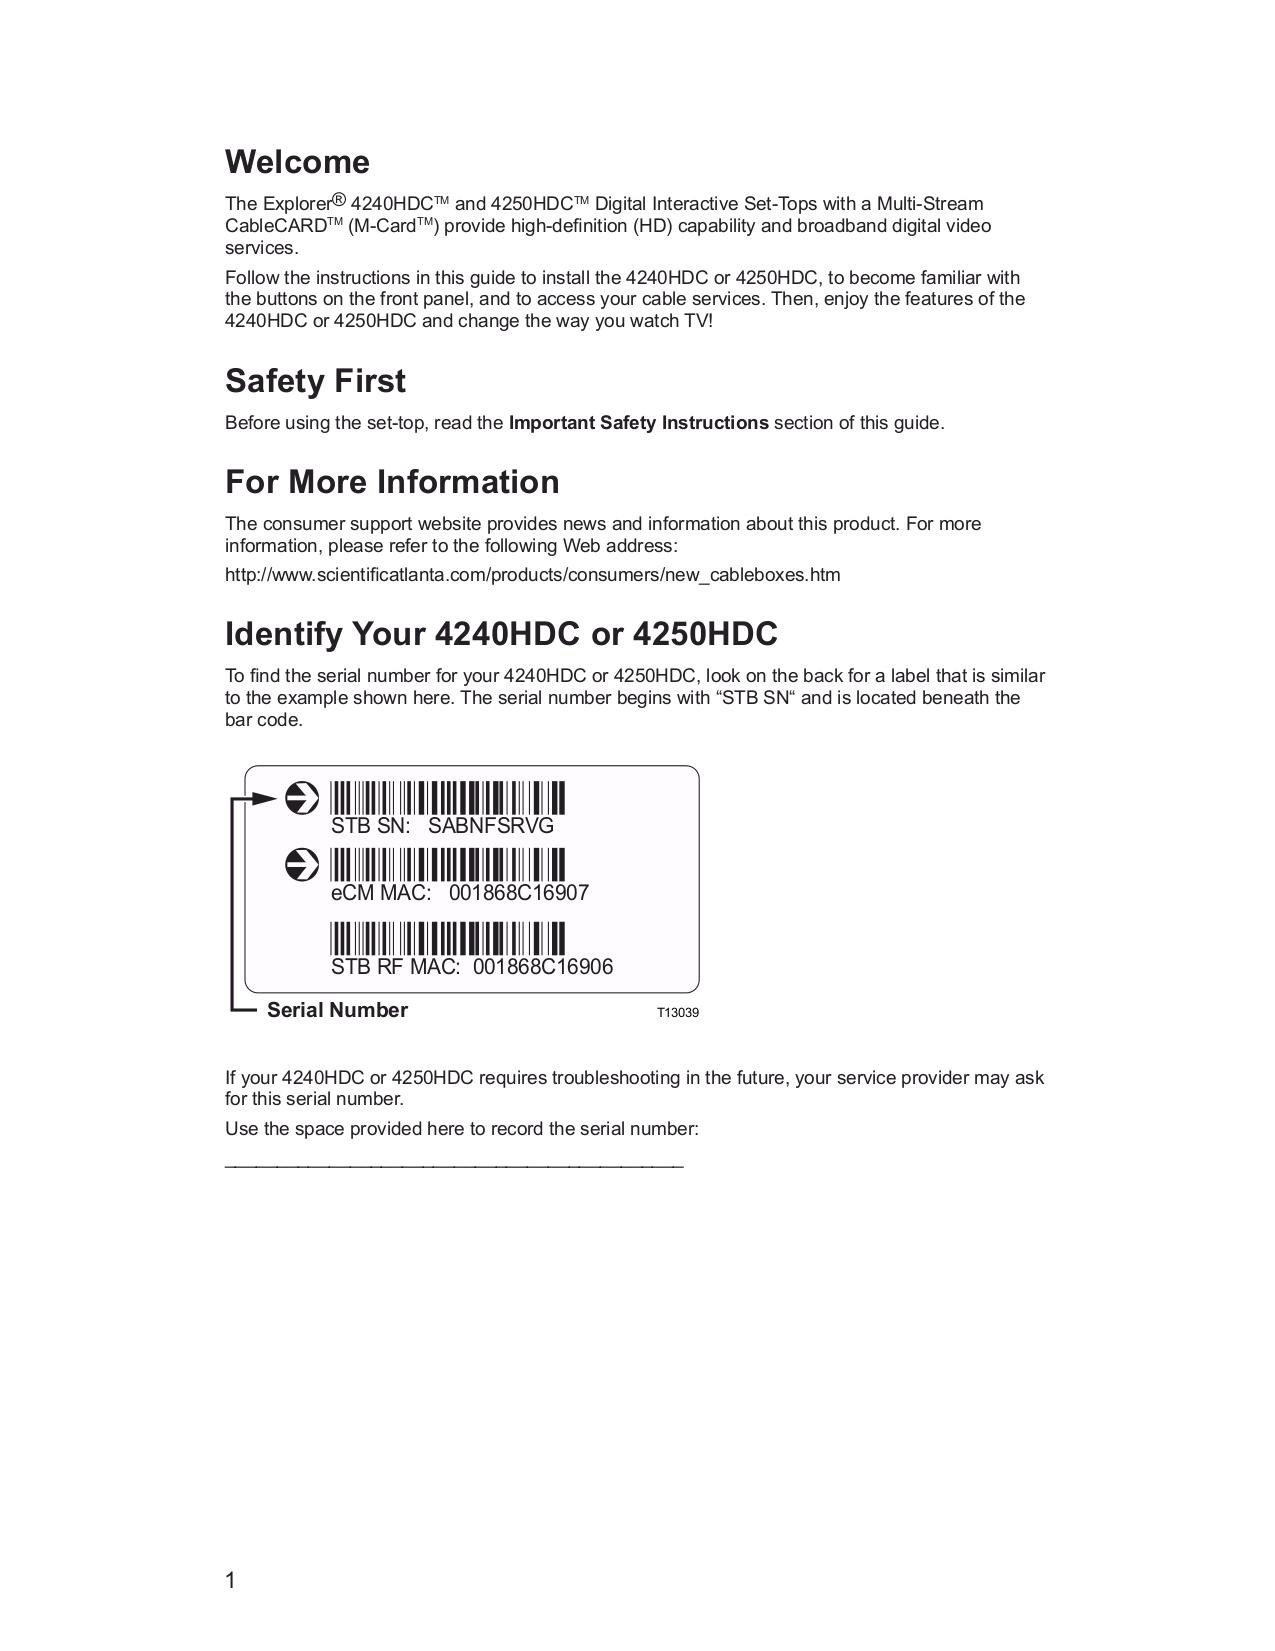 4250HDC MANUAL PDF